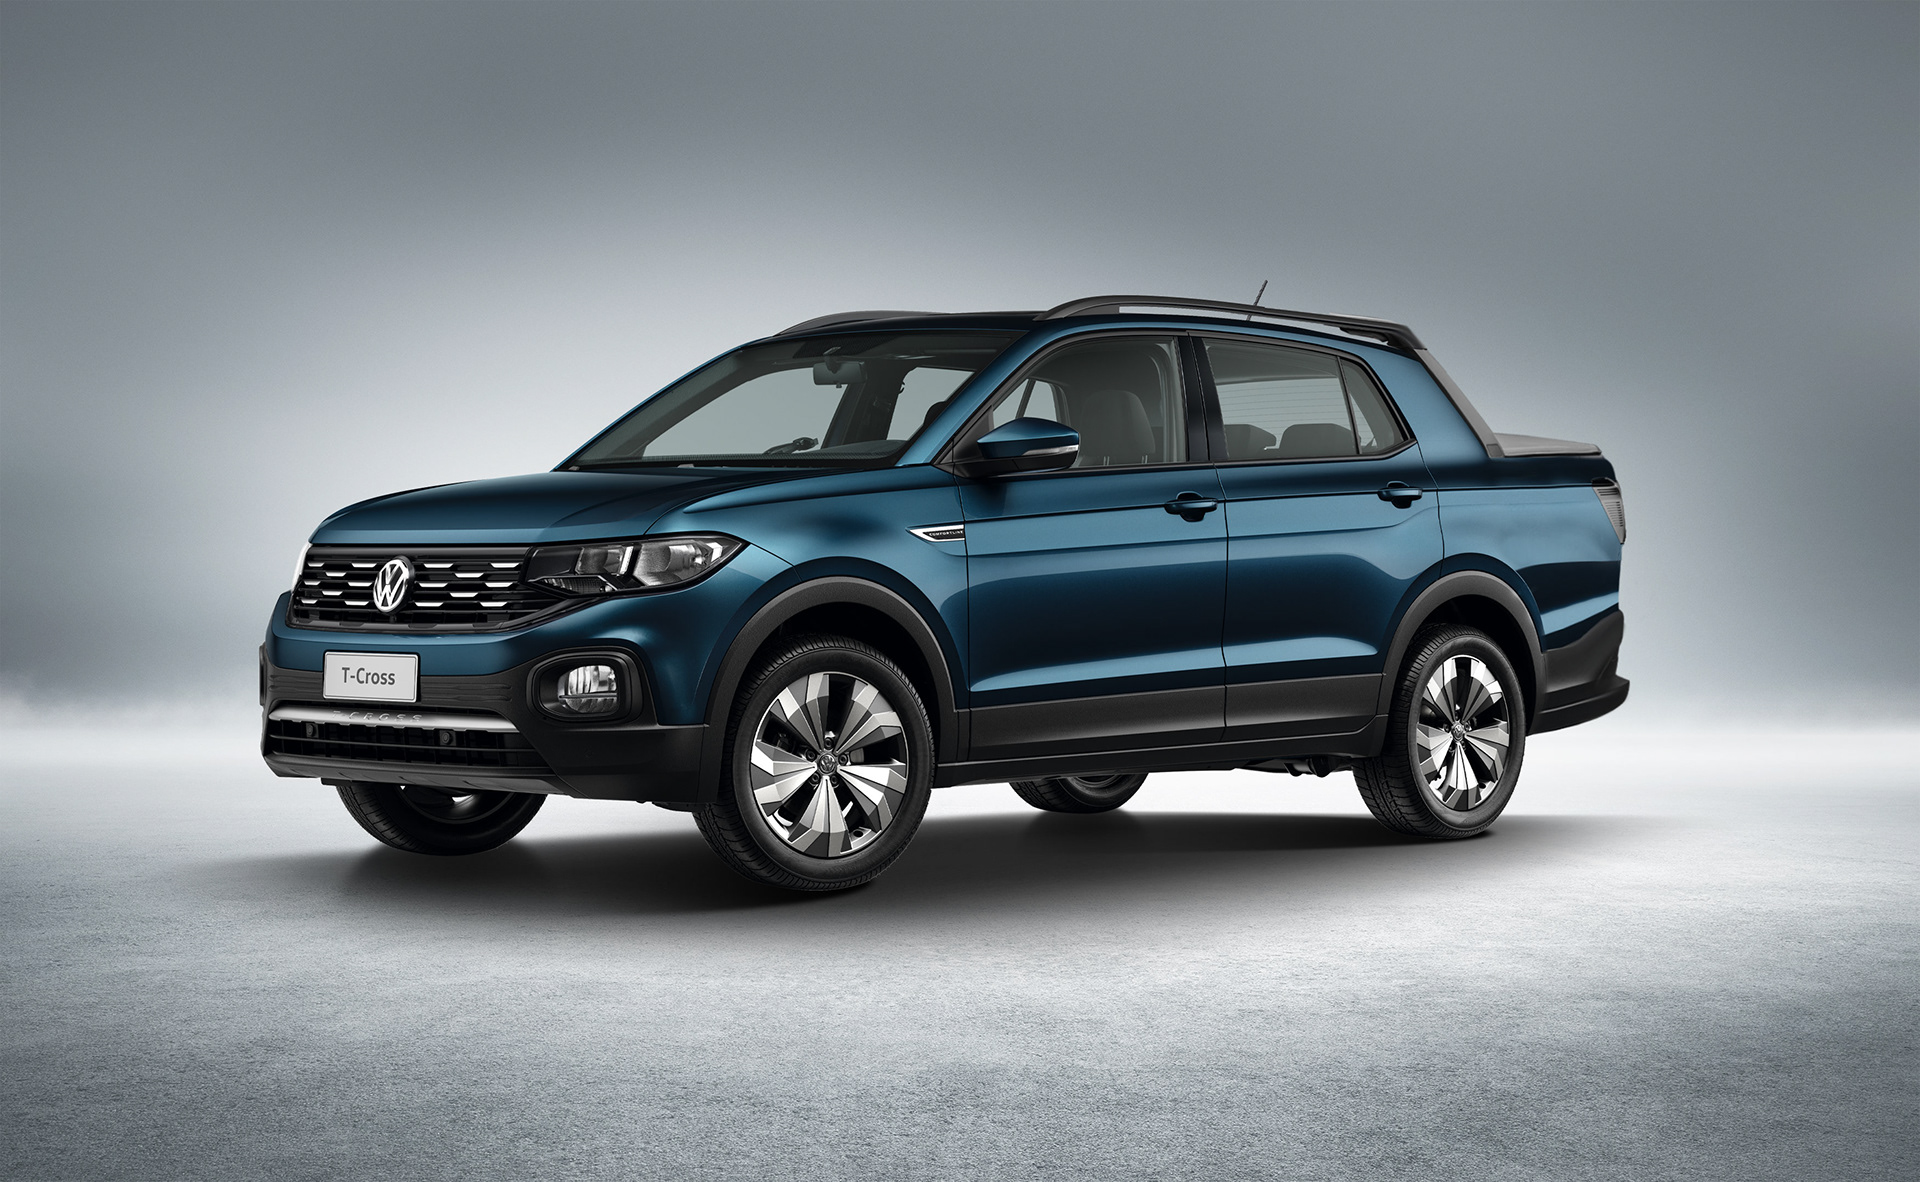 2020 - [Volkswagen] Tarok / MQB Pick-Up  Volkswagen-caddy-pickup-render-is-part-crossover-has-skoda-and-seat-brothers-146349_1